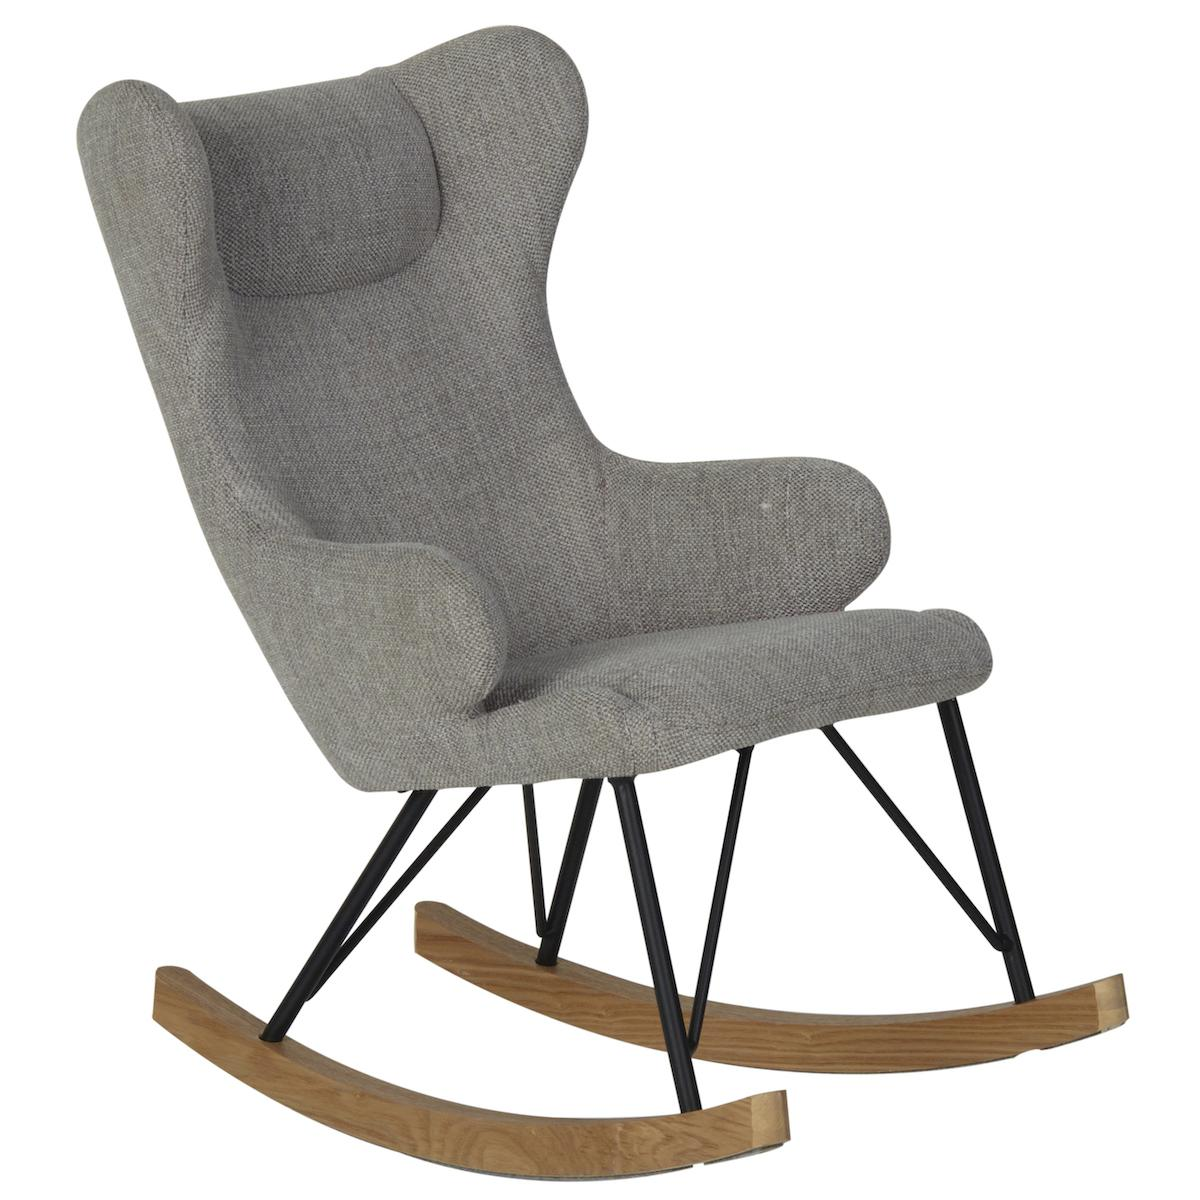 Kinderschaukelstuhl DE LUXE Quax sand grey